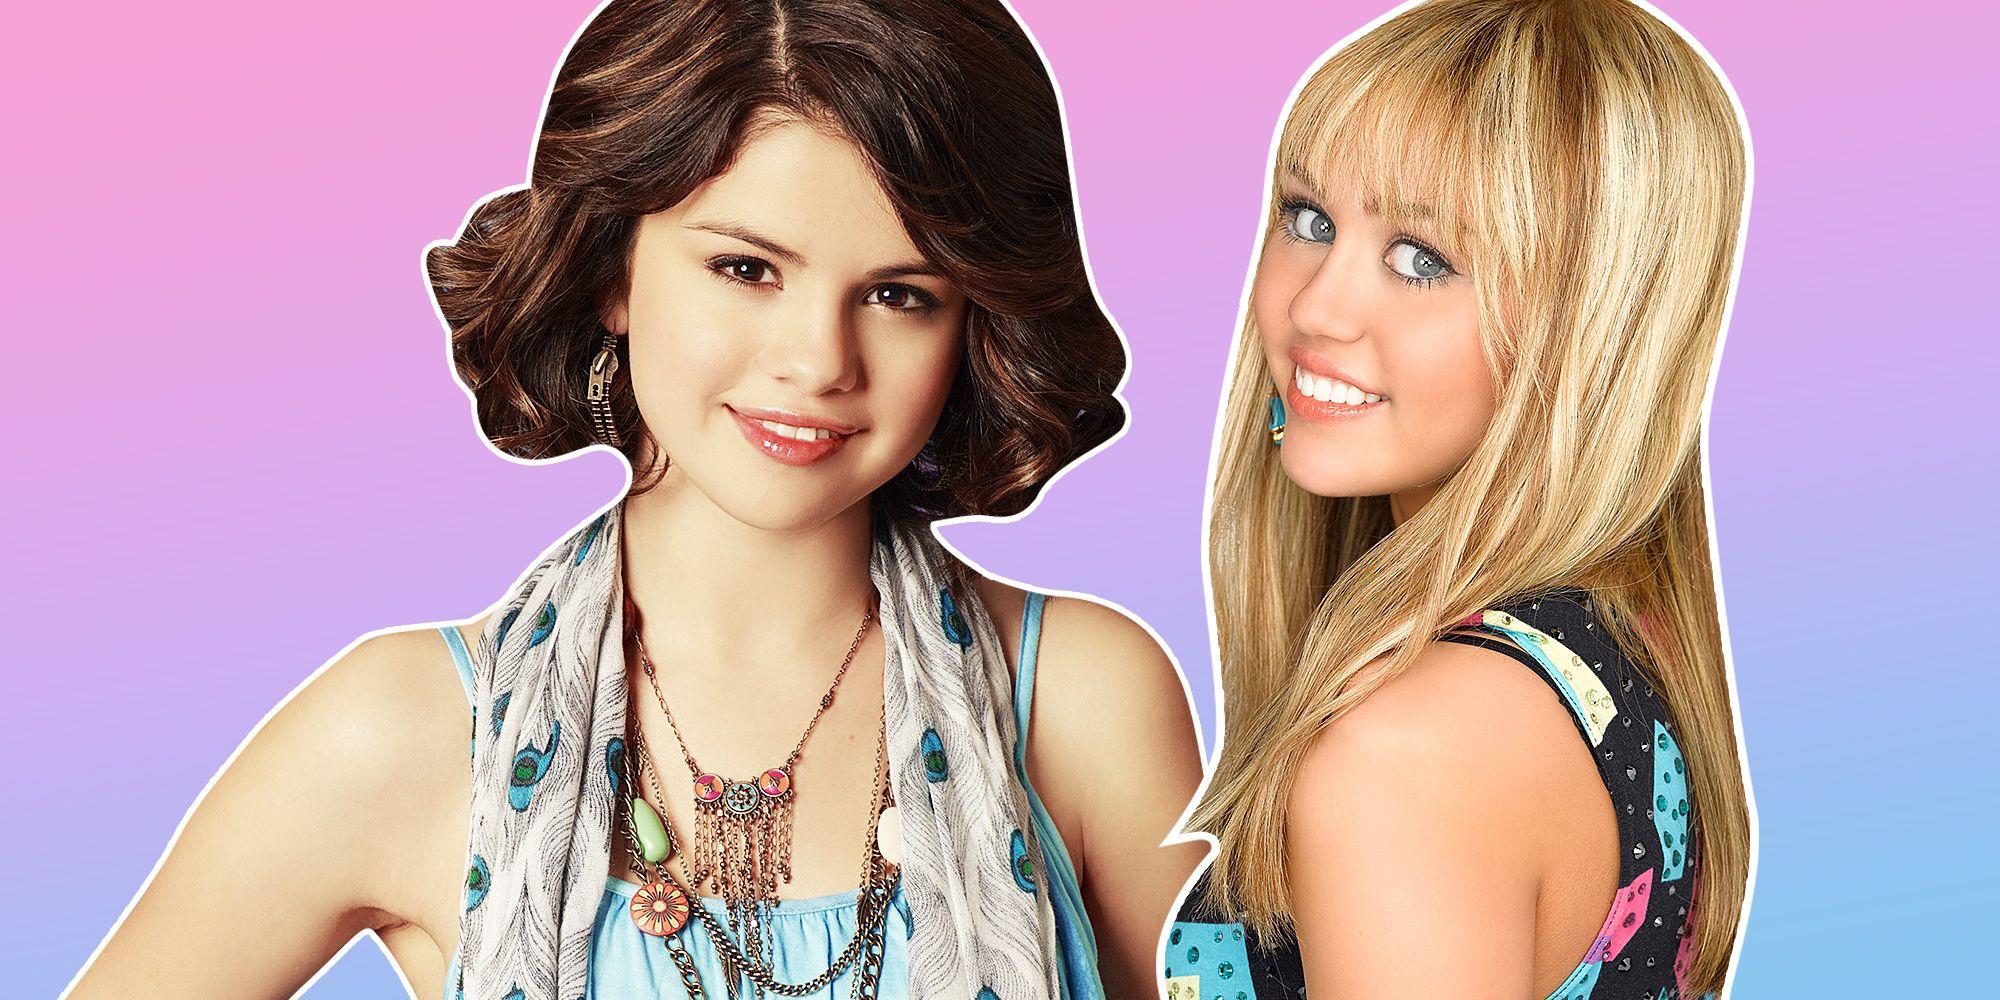 Wizards of Waverly Place Selena Gomez